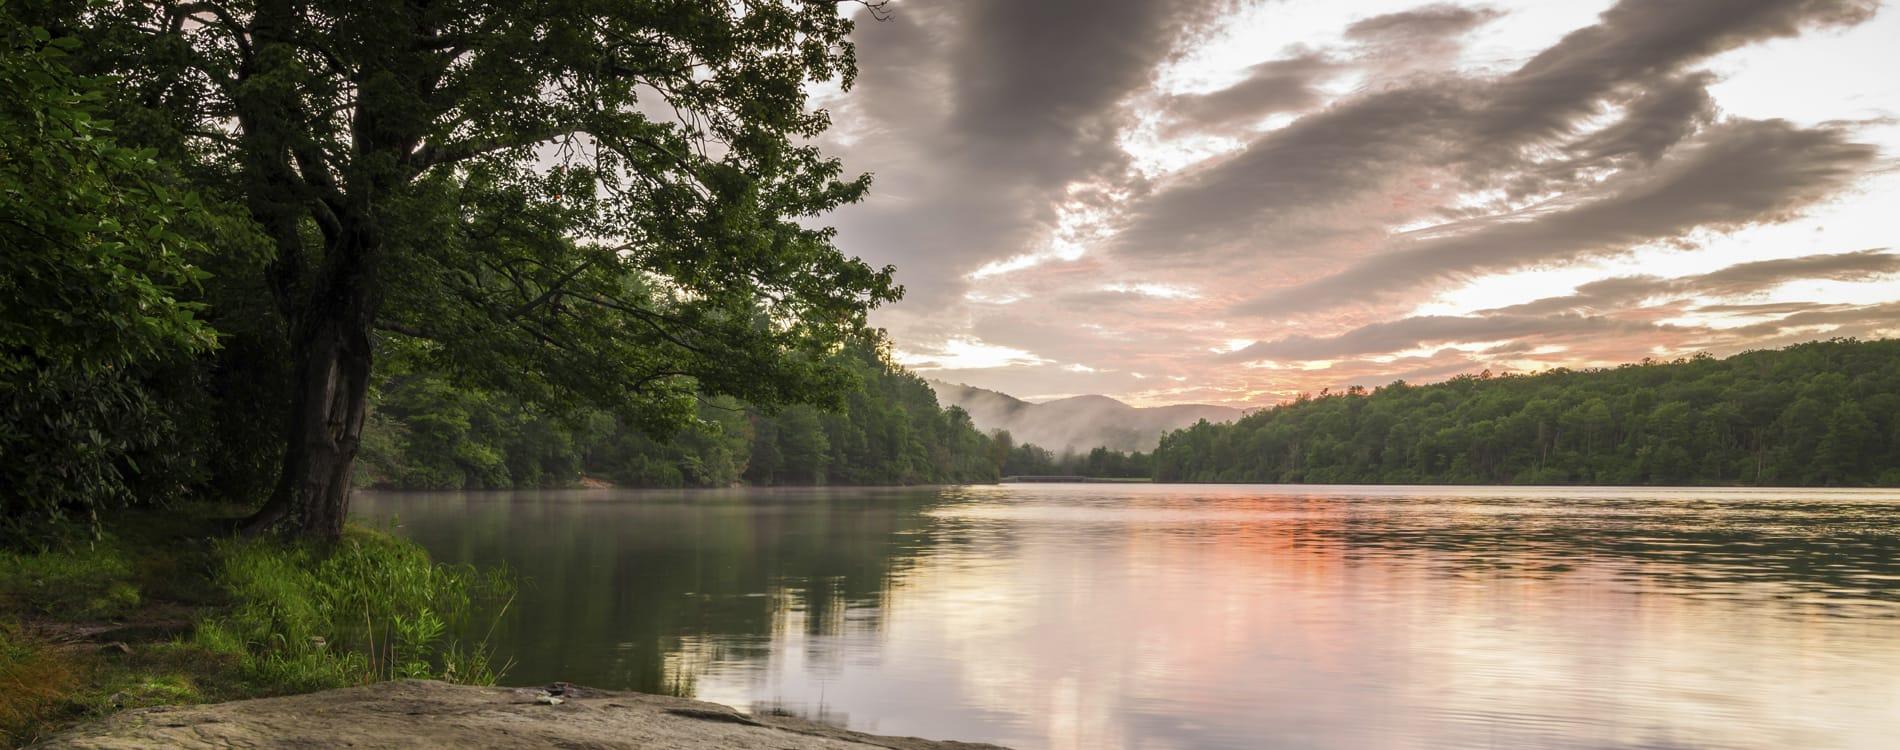 Boone North Carolina Cabin Rentals Amp Getaways All Cabins